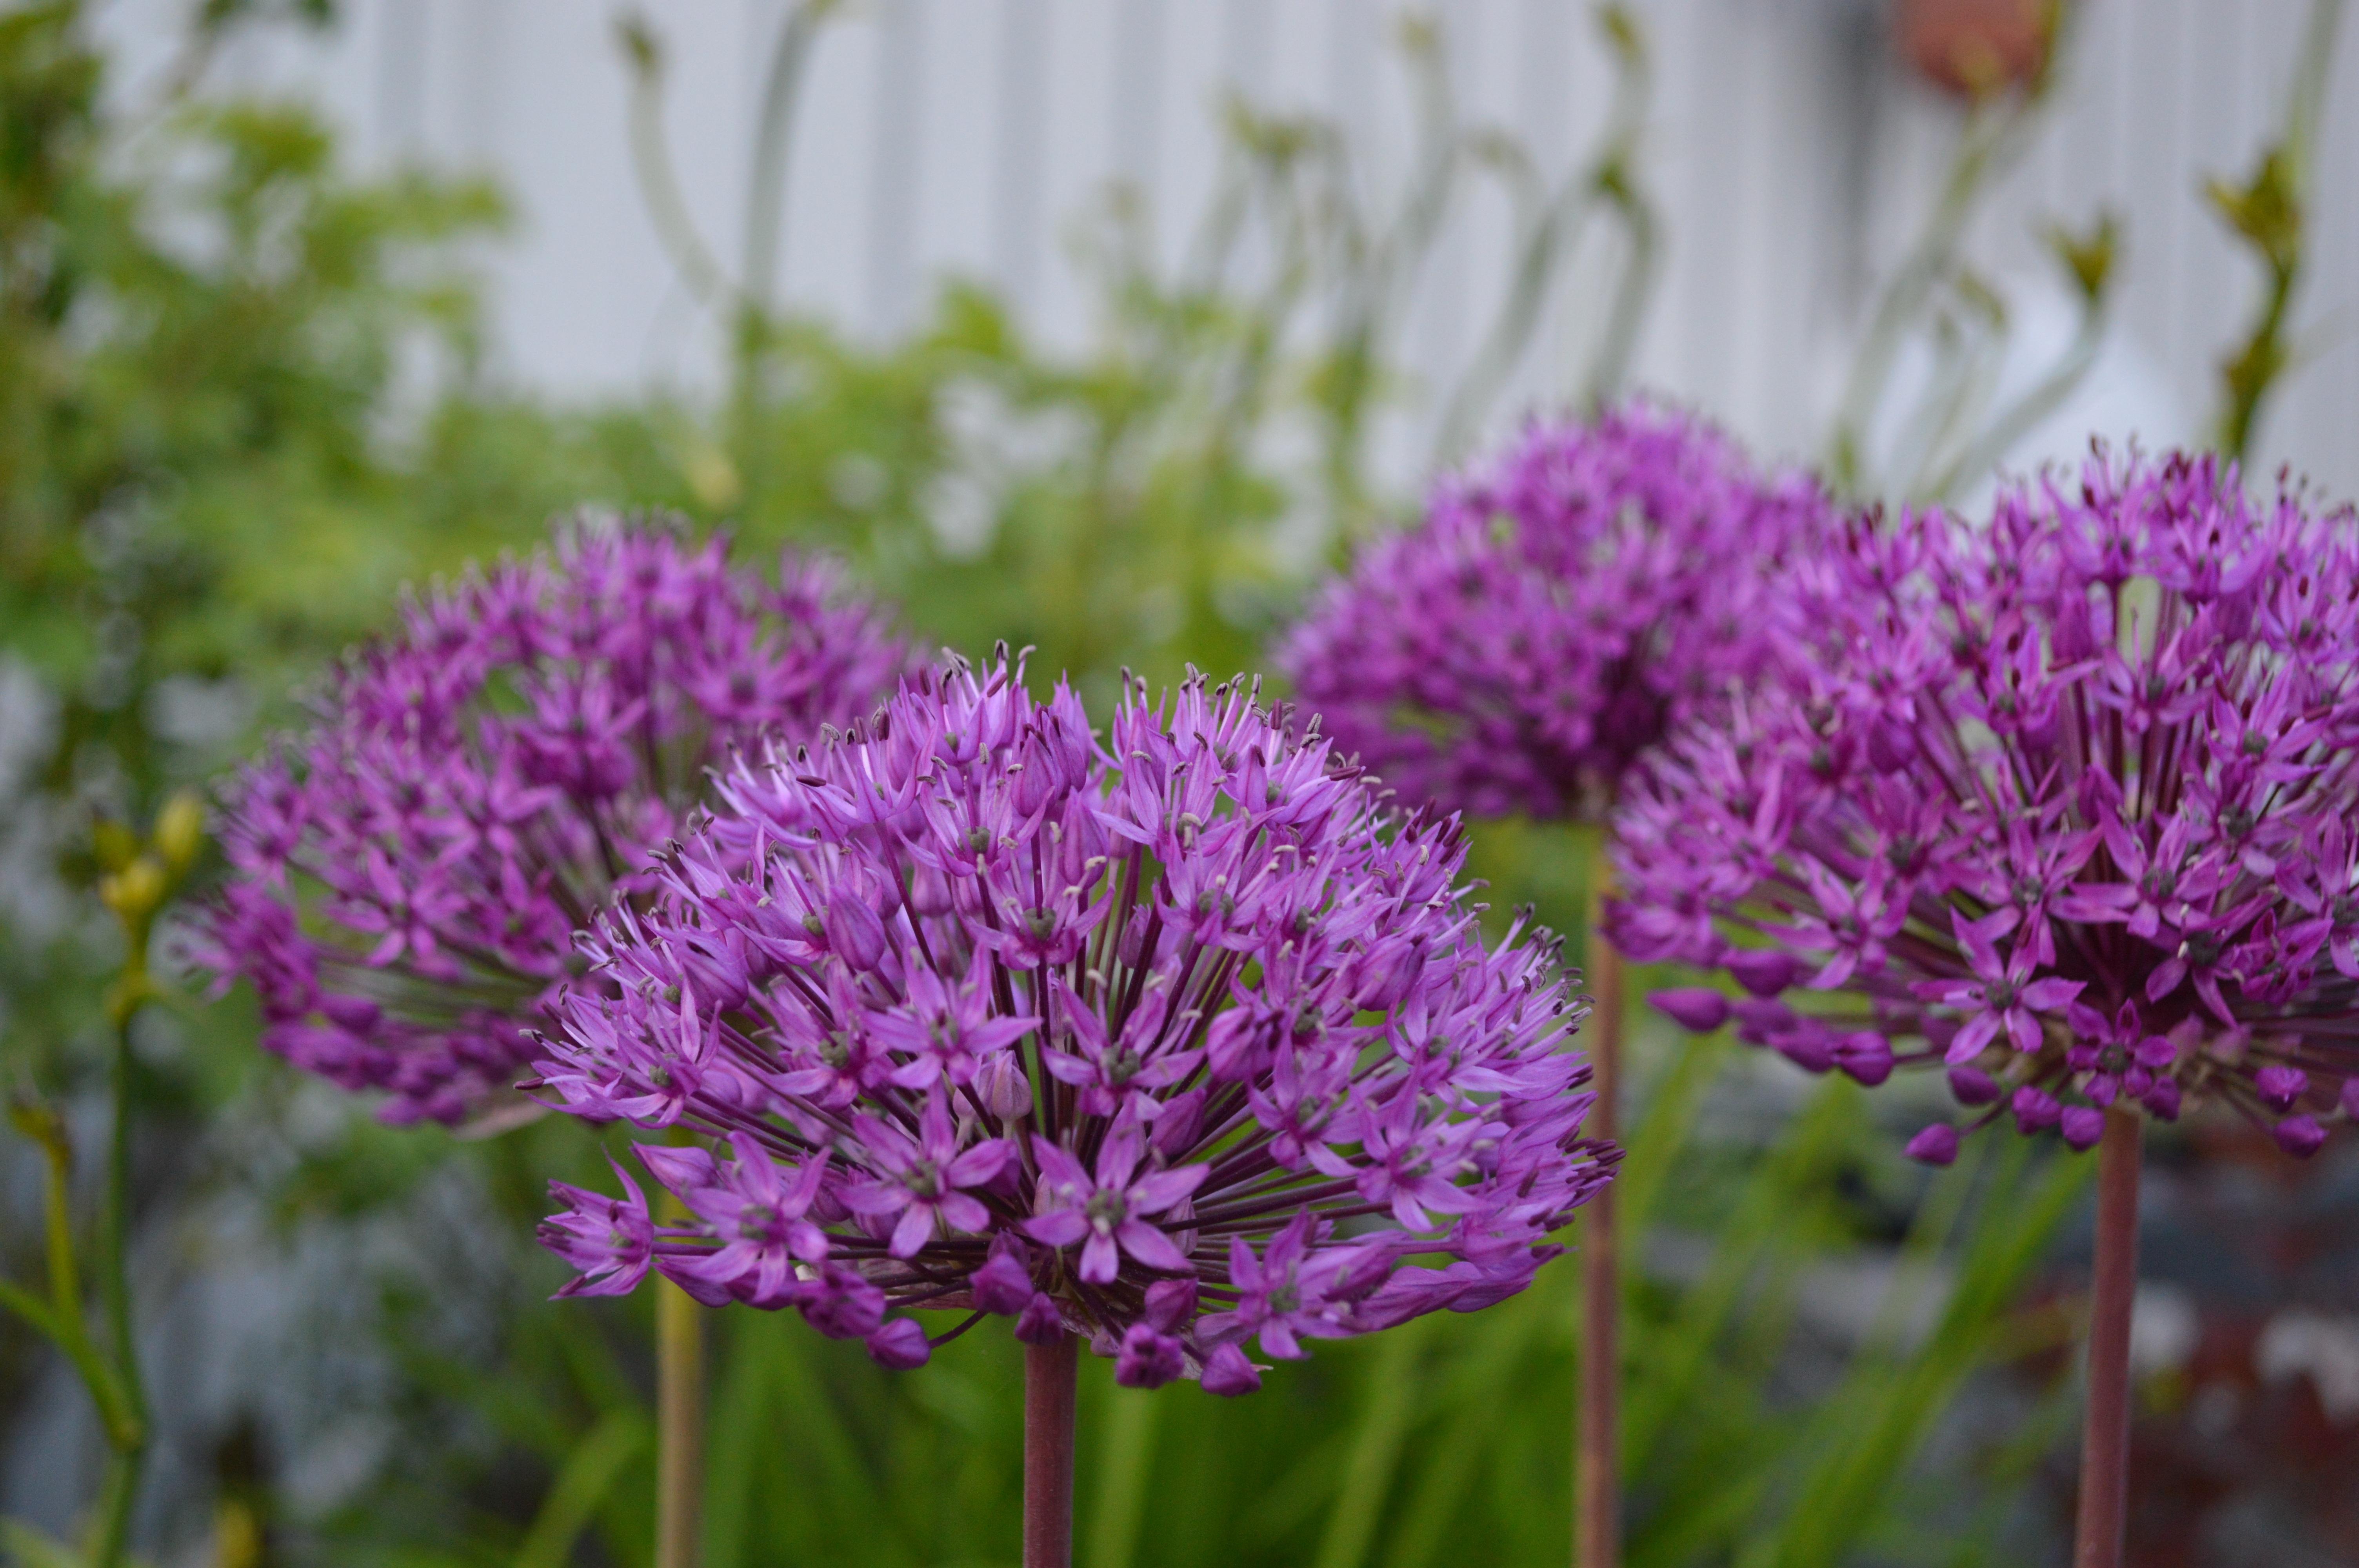 kostenlose foto blume lila fr hling kraut produzieren botanik garten nahansicht flora. Black Bedroom Furniture Sets. Home Design Ideas